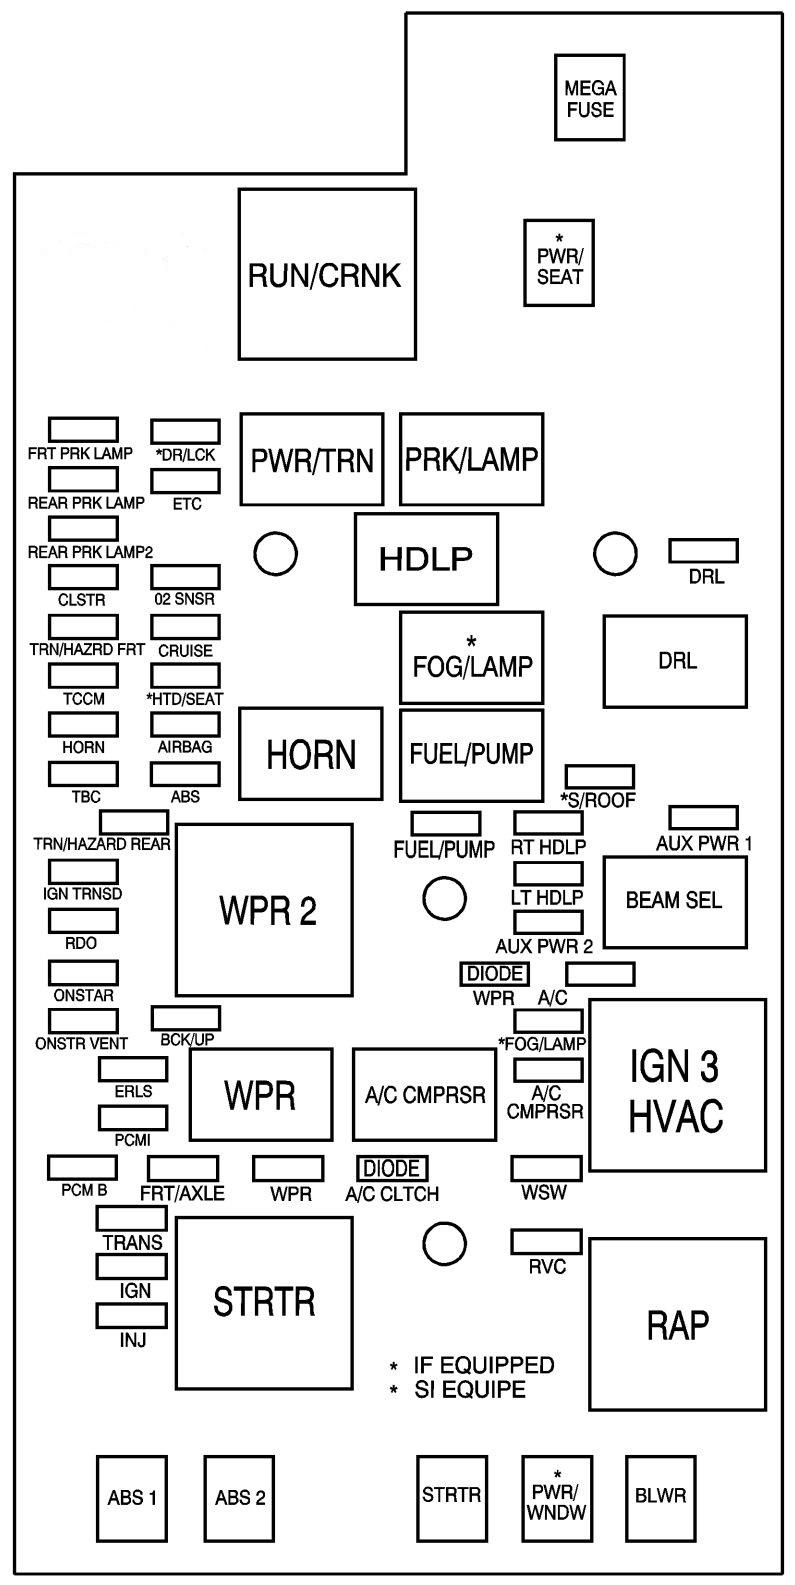 [SCHEMATICS_43NM]  06 Chevy Equinox Fuse Box Diagram - 1988 Rallye Motorhome Wiring Diagram  Ford for Wiring Diagram Schematics | 2008 Chevy Equinox Fuse Box Picture |  | Wiring Diagram Schematics